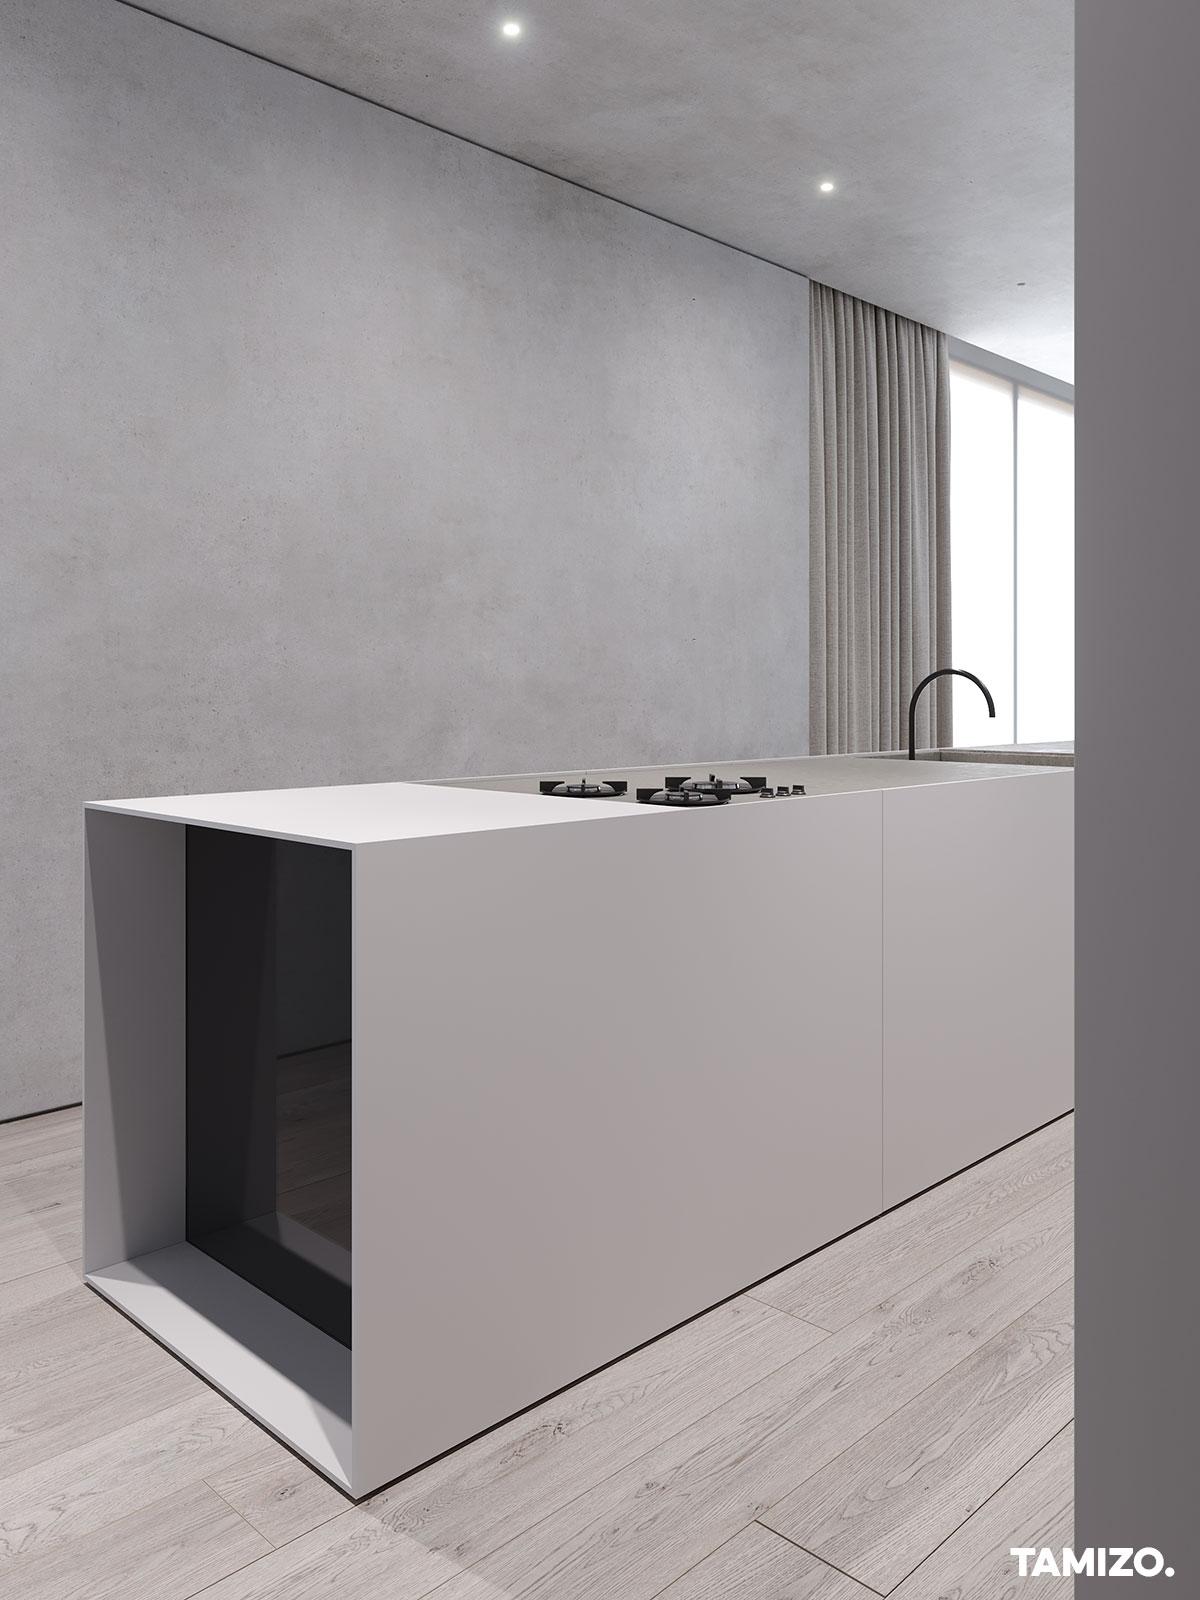 tamizo_architects_mateusz_kuo_stolarski_warszawa_iterior_design_house_minimal_01